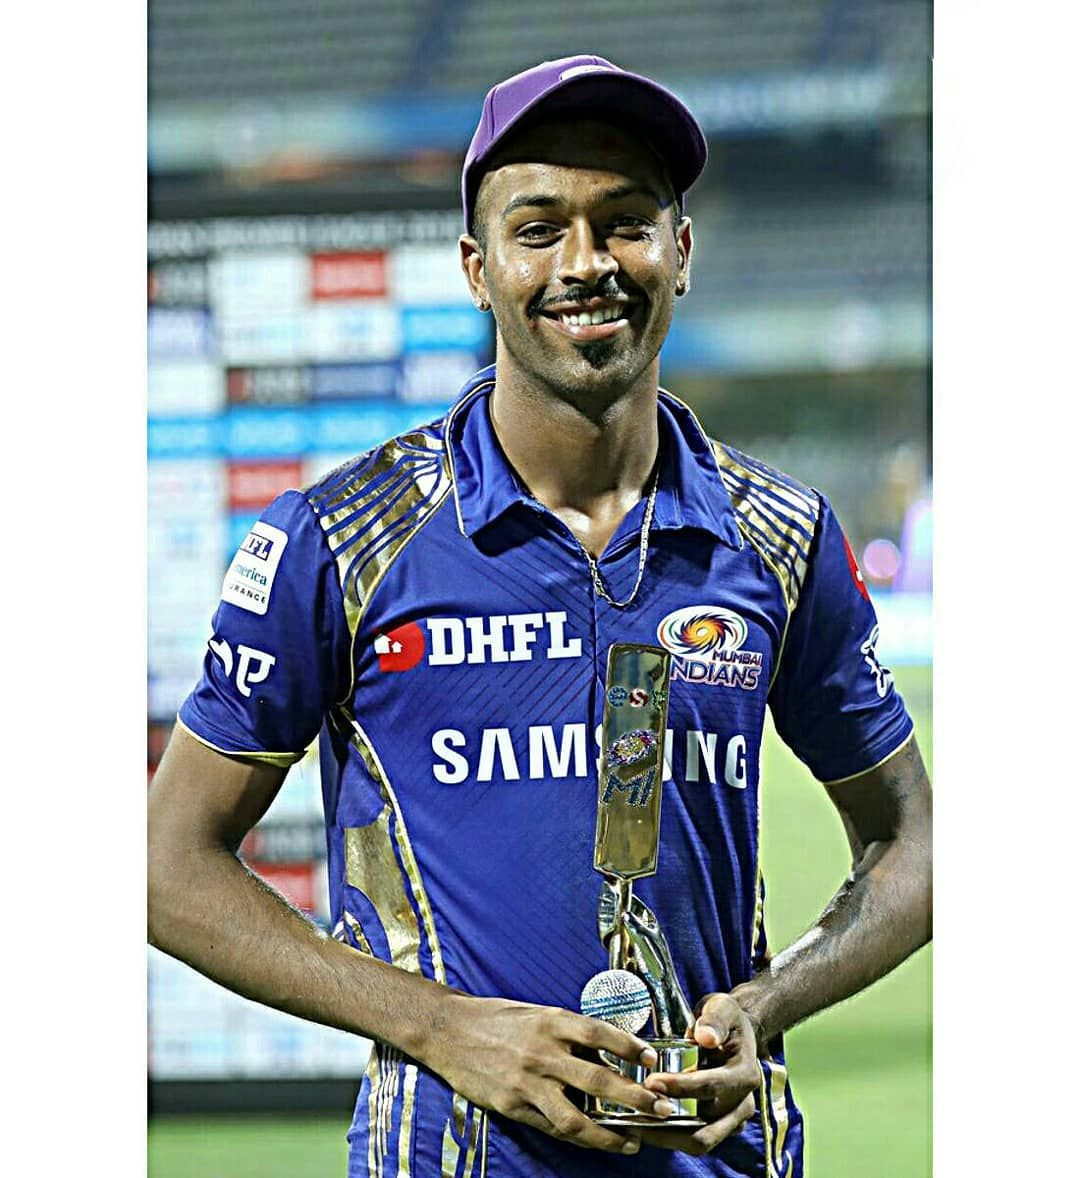 Hardik Pandya On Instagram Hardik Pandya For You Mumbai Indians Instagram Champion